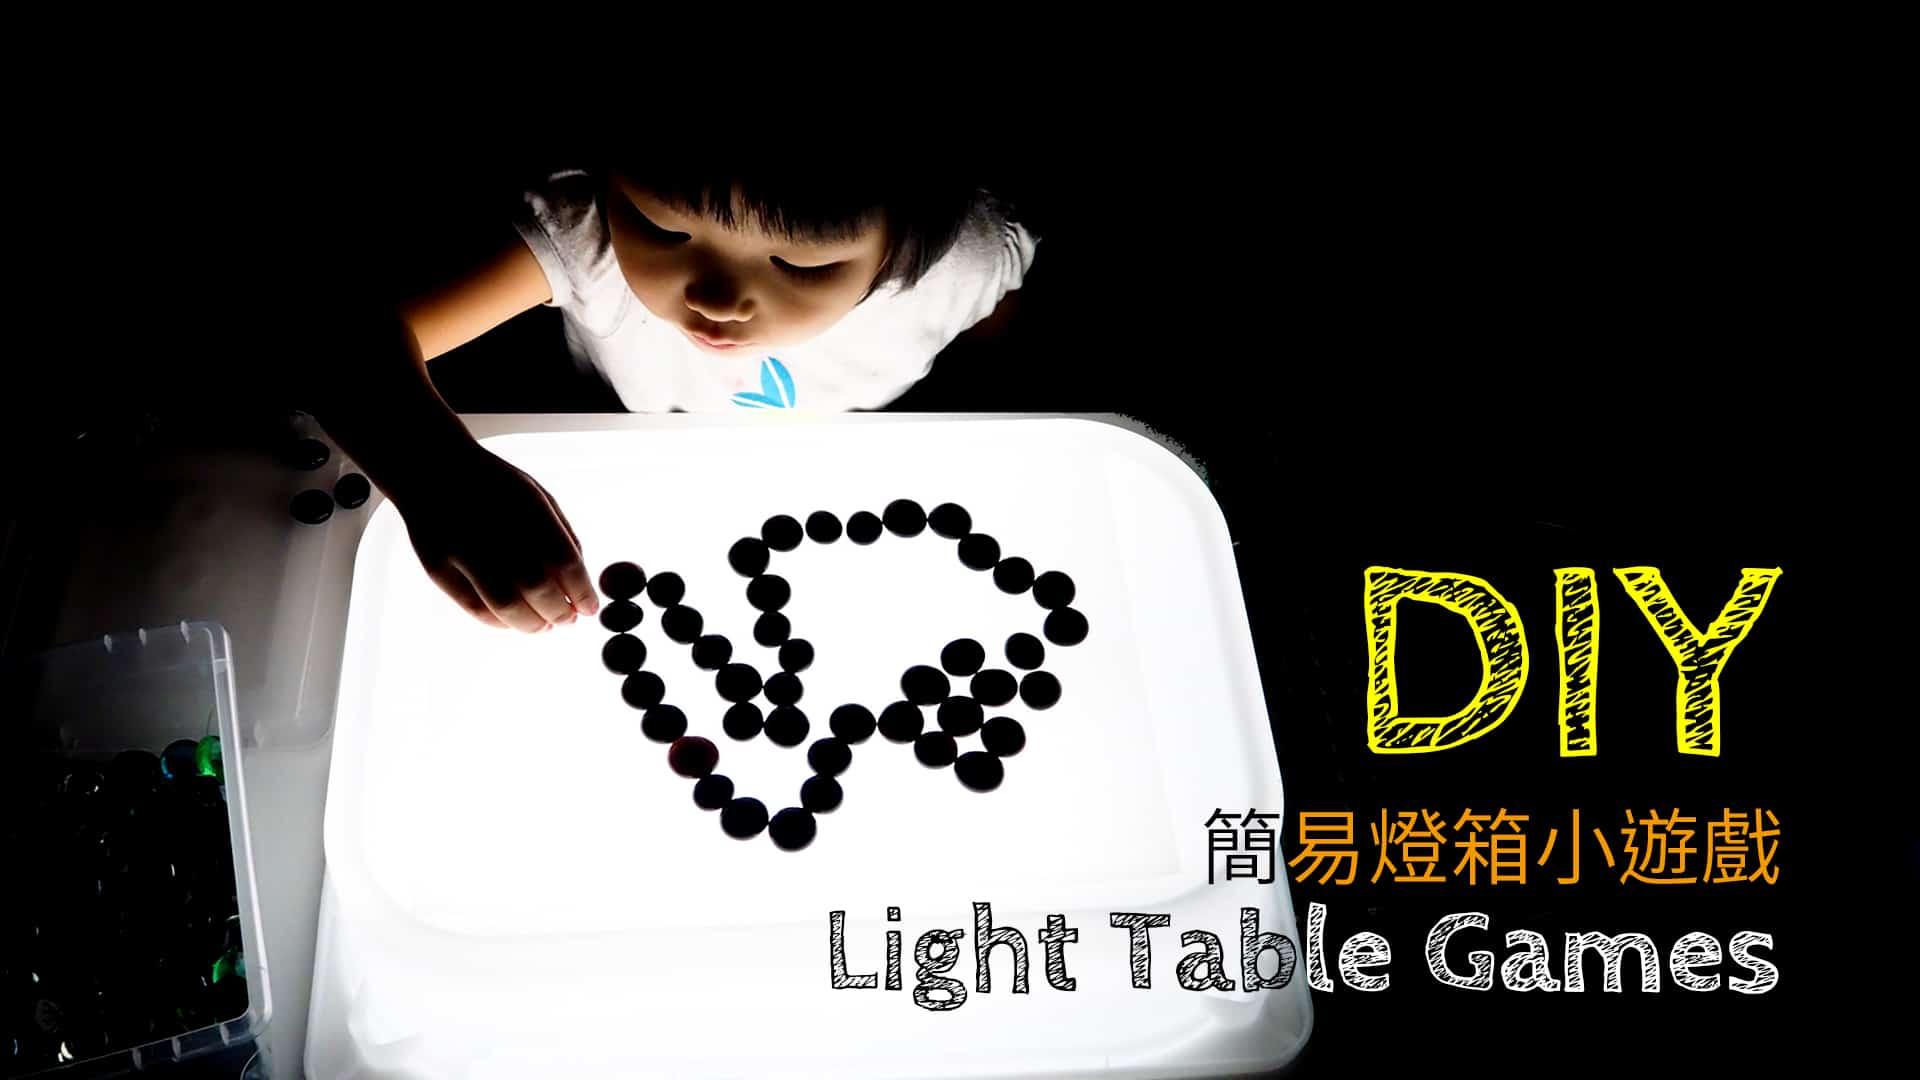 DIY 簡易燈箱小遊戲 Light Table Games